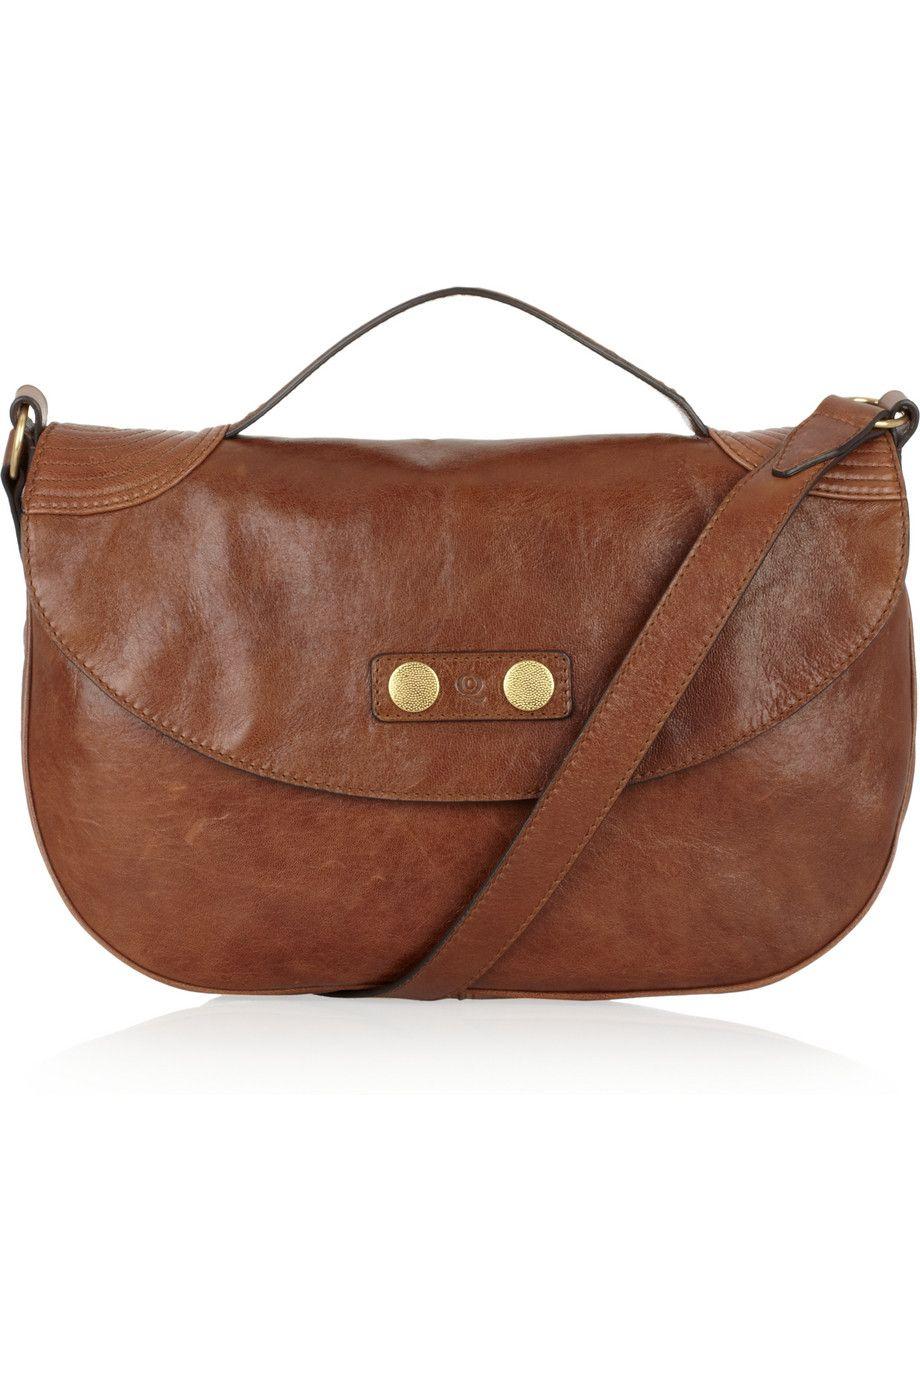 8172e5f363 The Cross Body Bag --  Alexander McQueen Faithful leather satchel ...